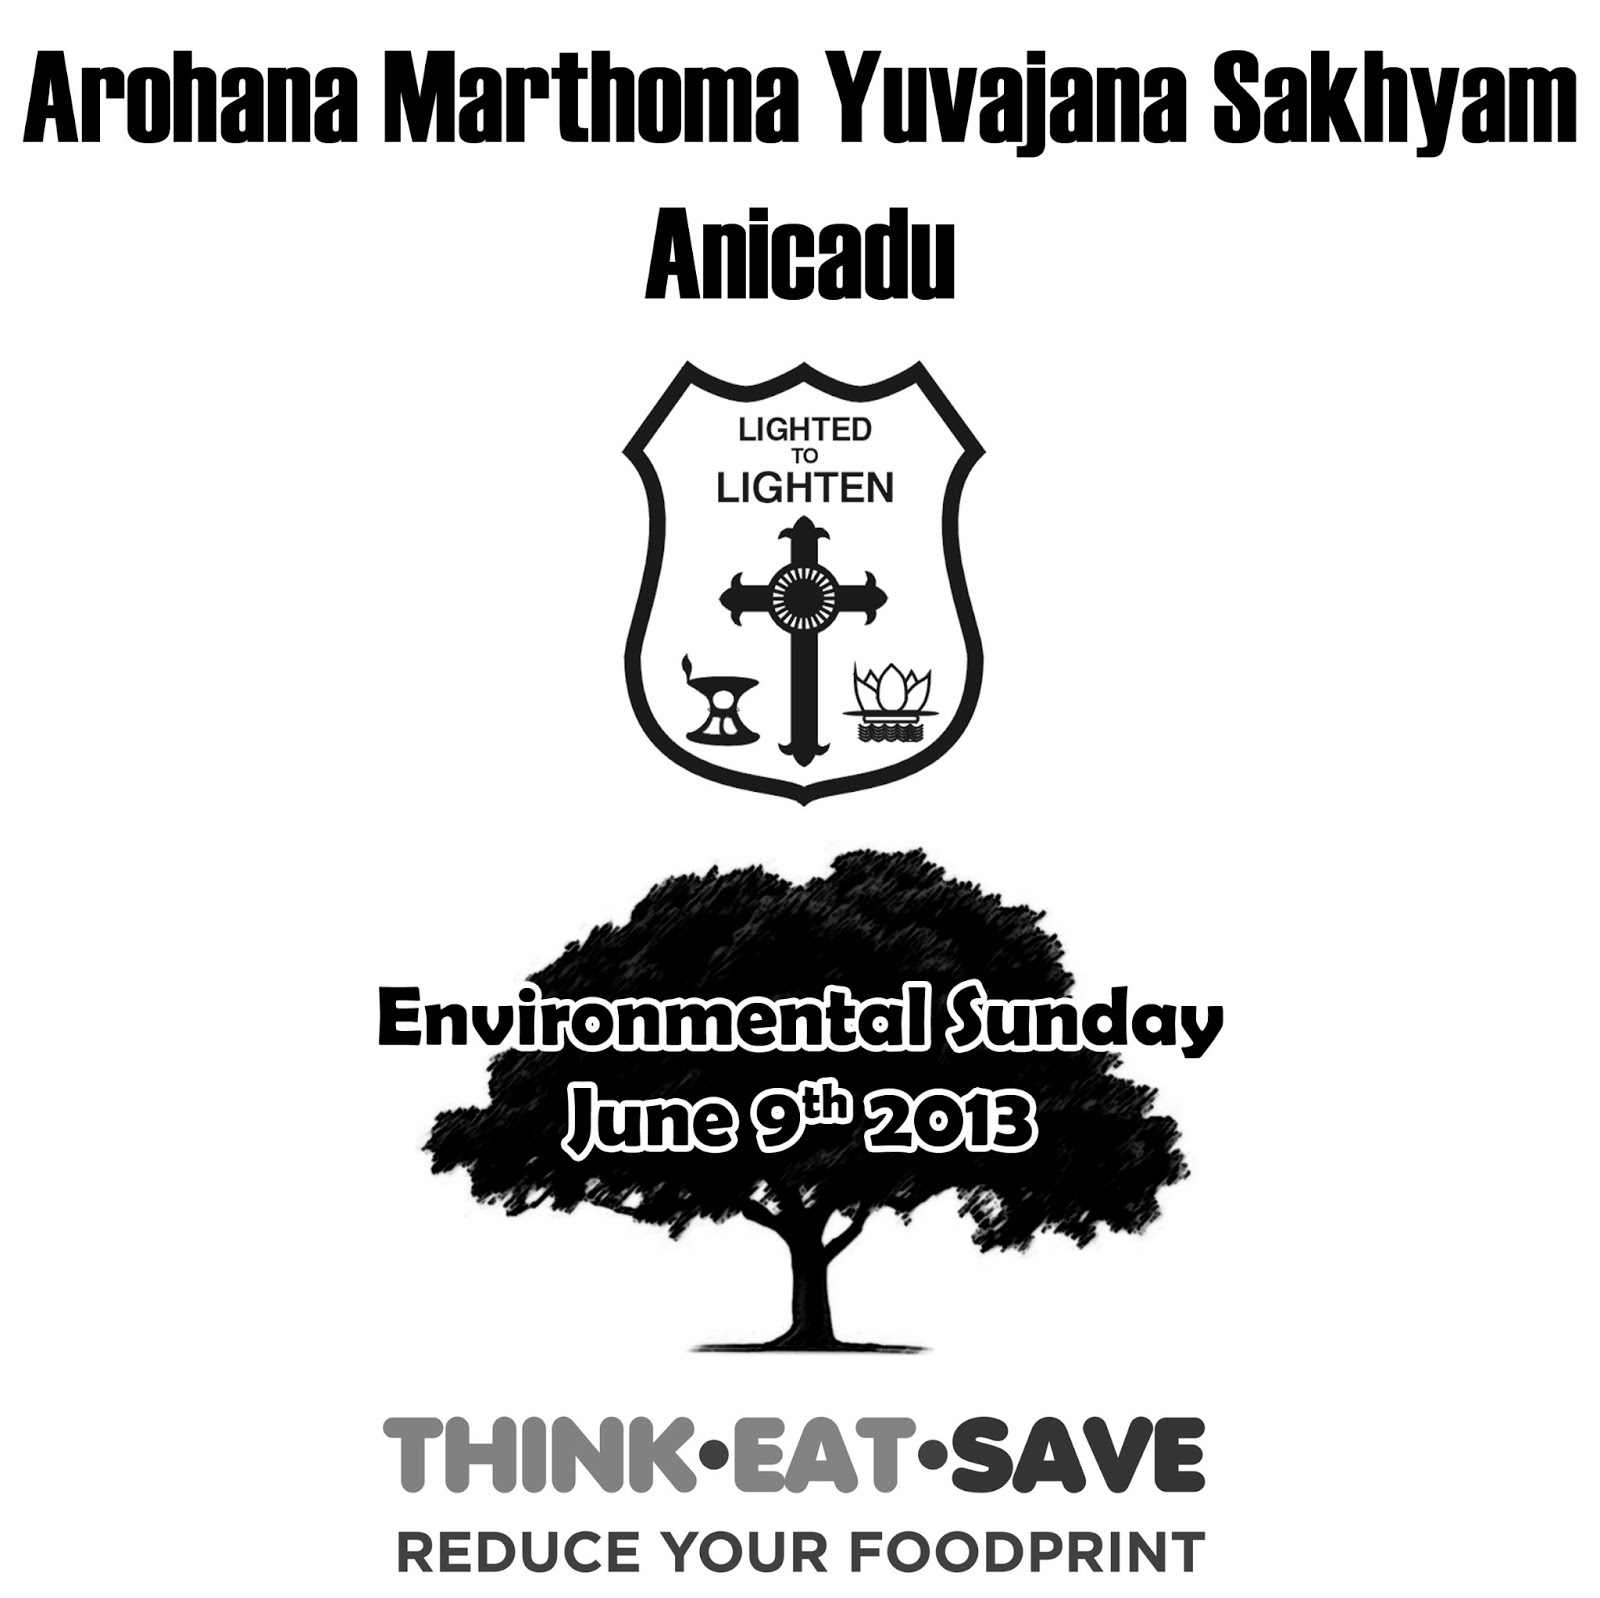 Arohana Marthoma Yuvajana Sakhyam, Anicadu